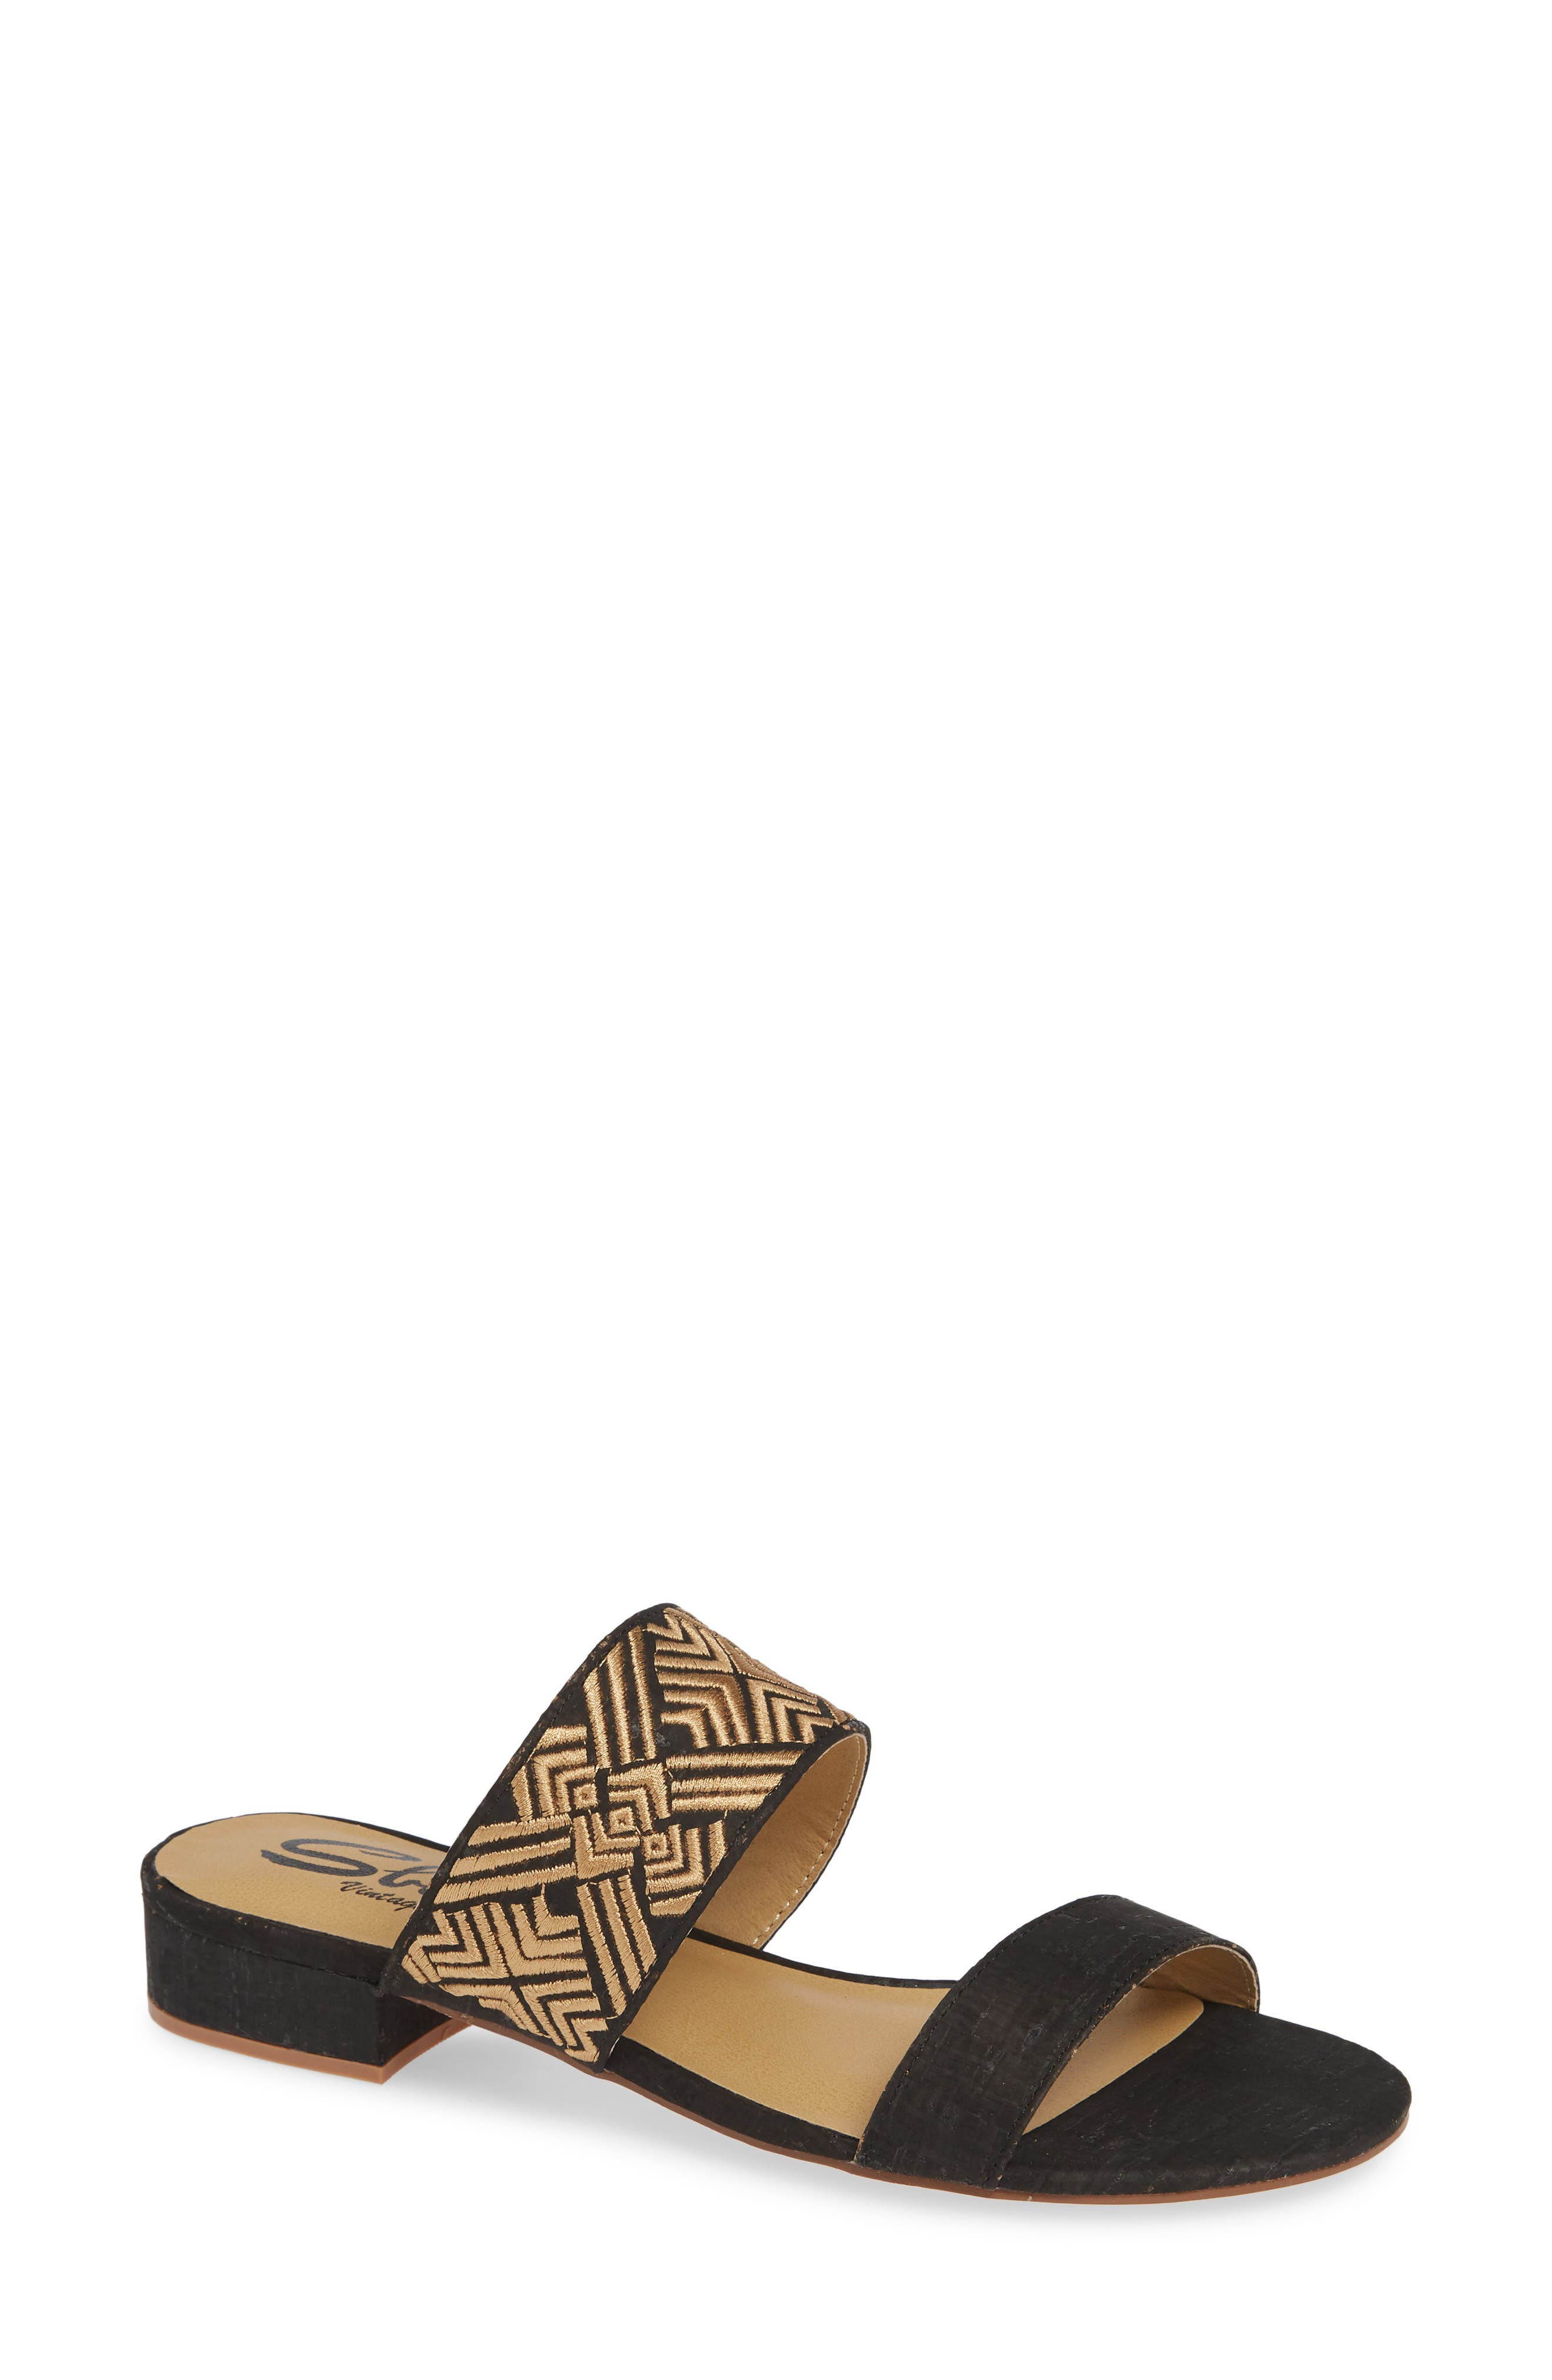 Valora Slide Sandal,                         Main,                         color, BLACK FABRIC